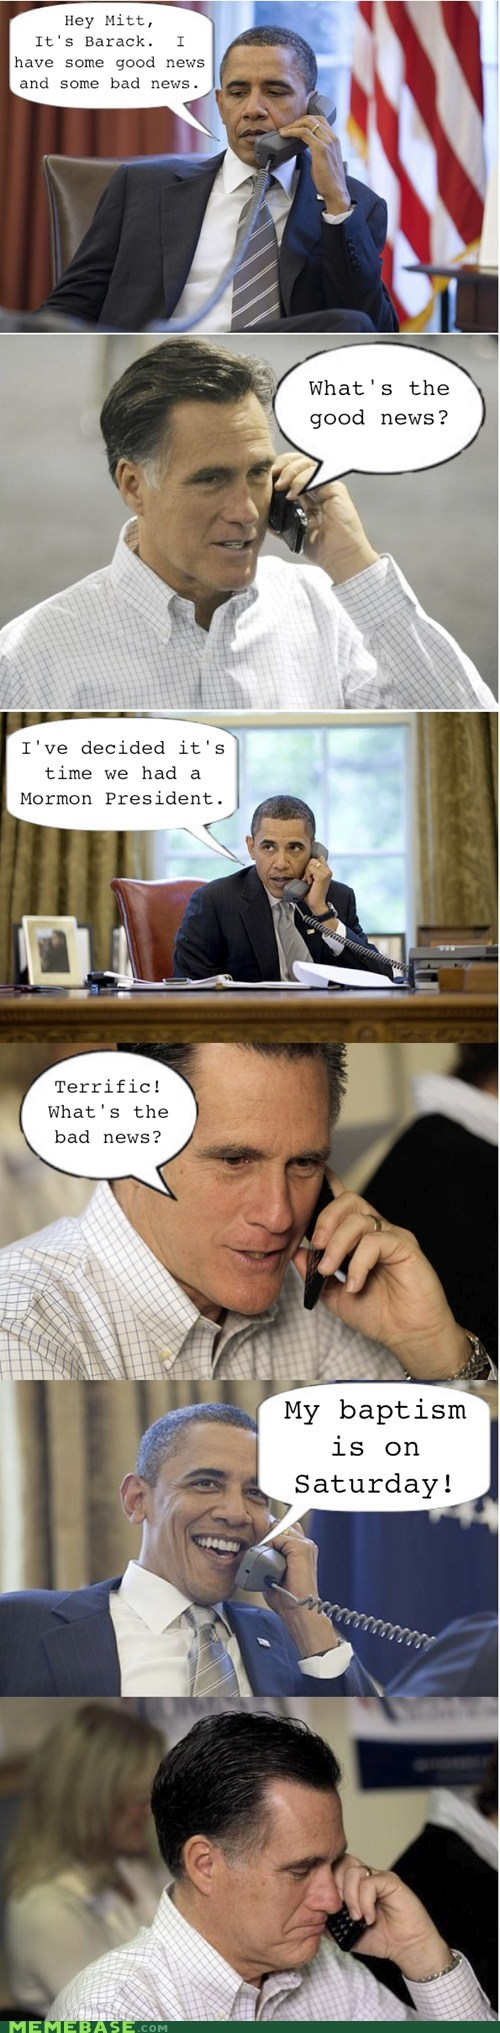 2012 Presidential Campaig barack obama mormon politics president - 6120131328